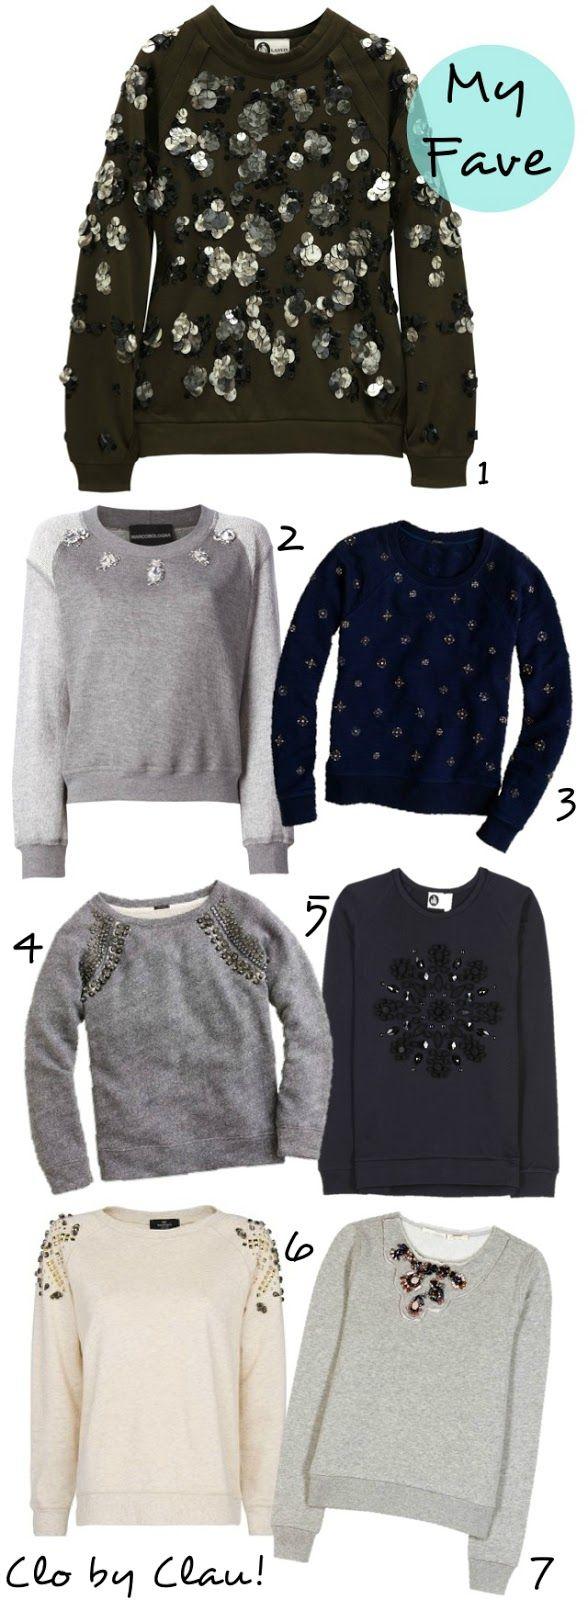 DIY Inspiration: Embellished Sweatshirt I dont like the first one but  i like the rest